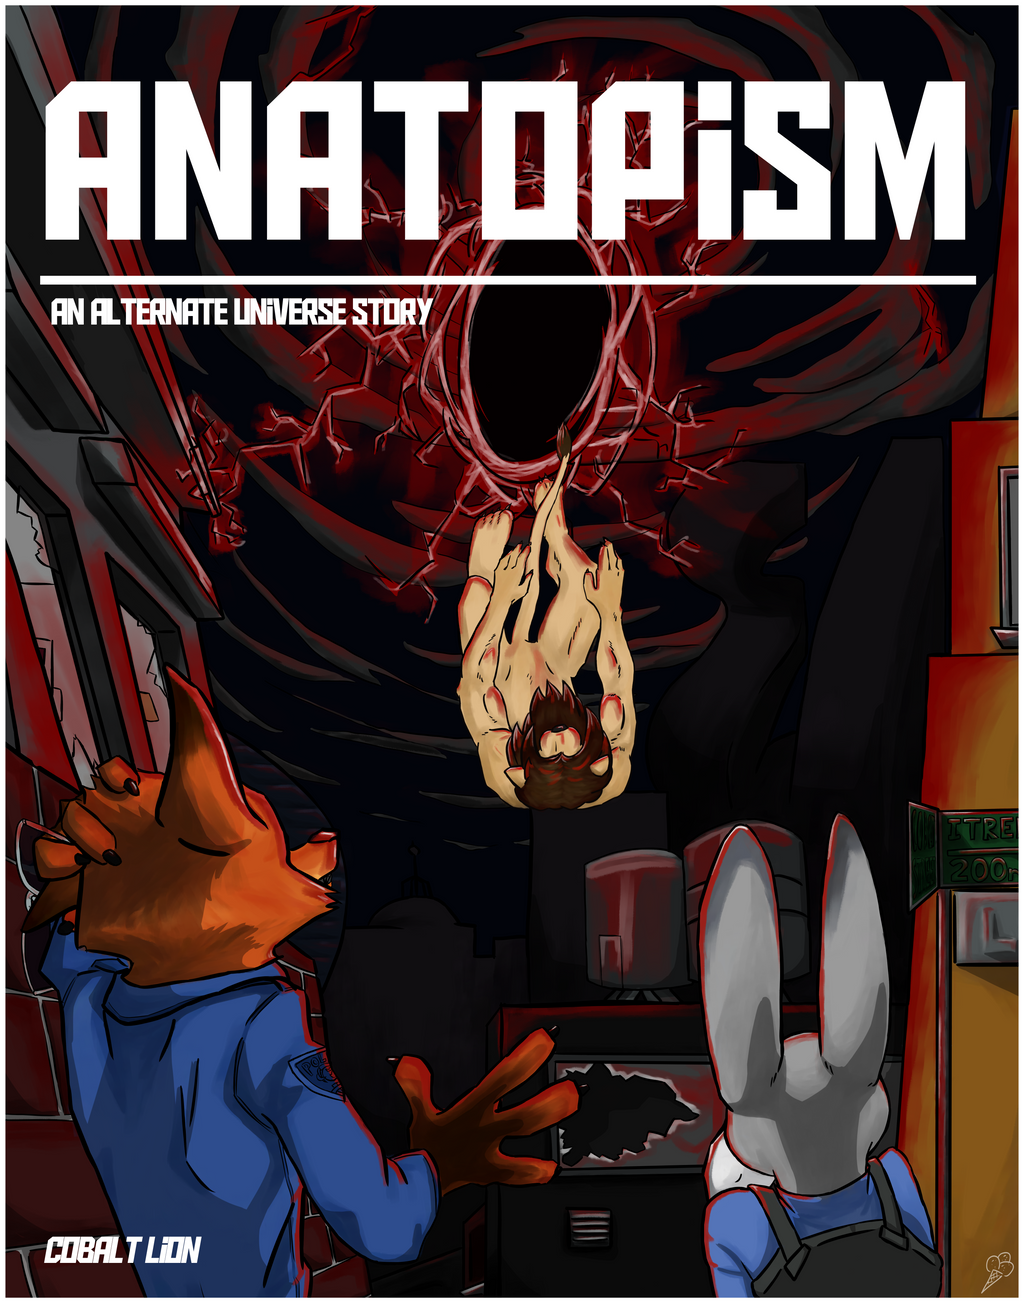 Story: Anatopism: An Alternate Universe Story